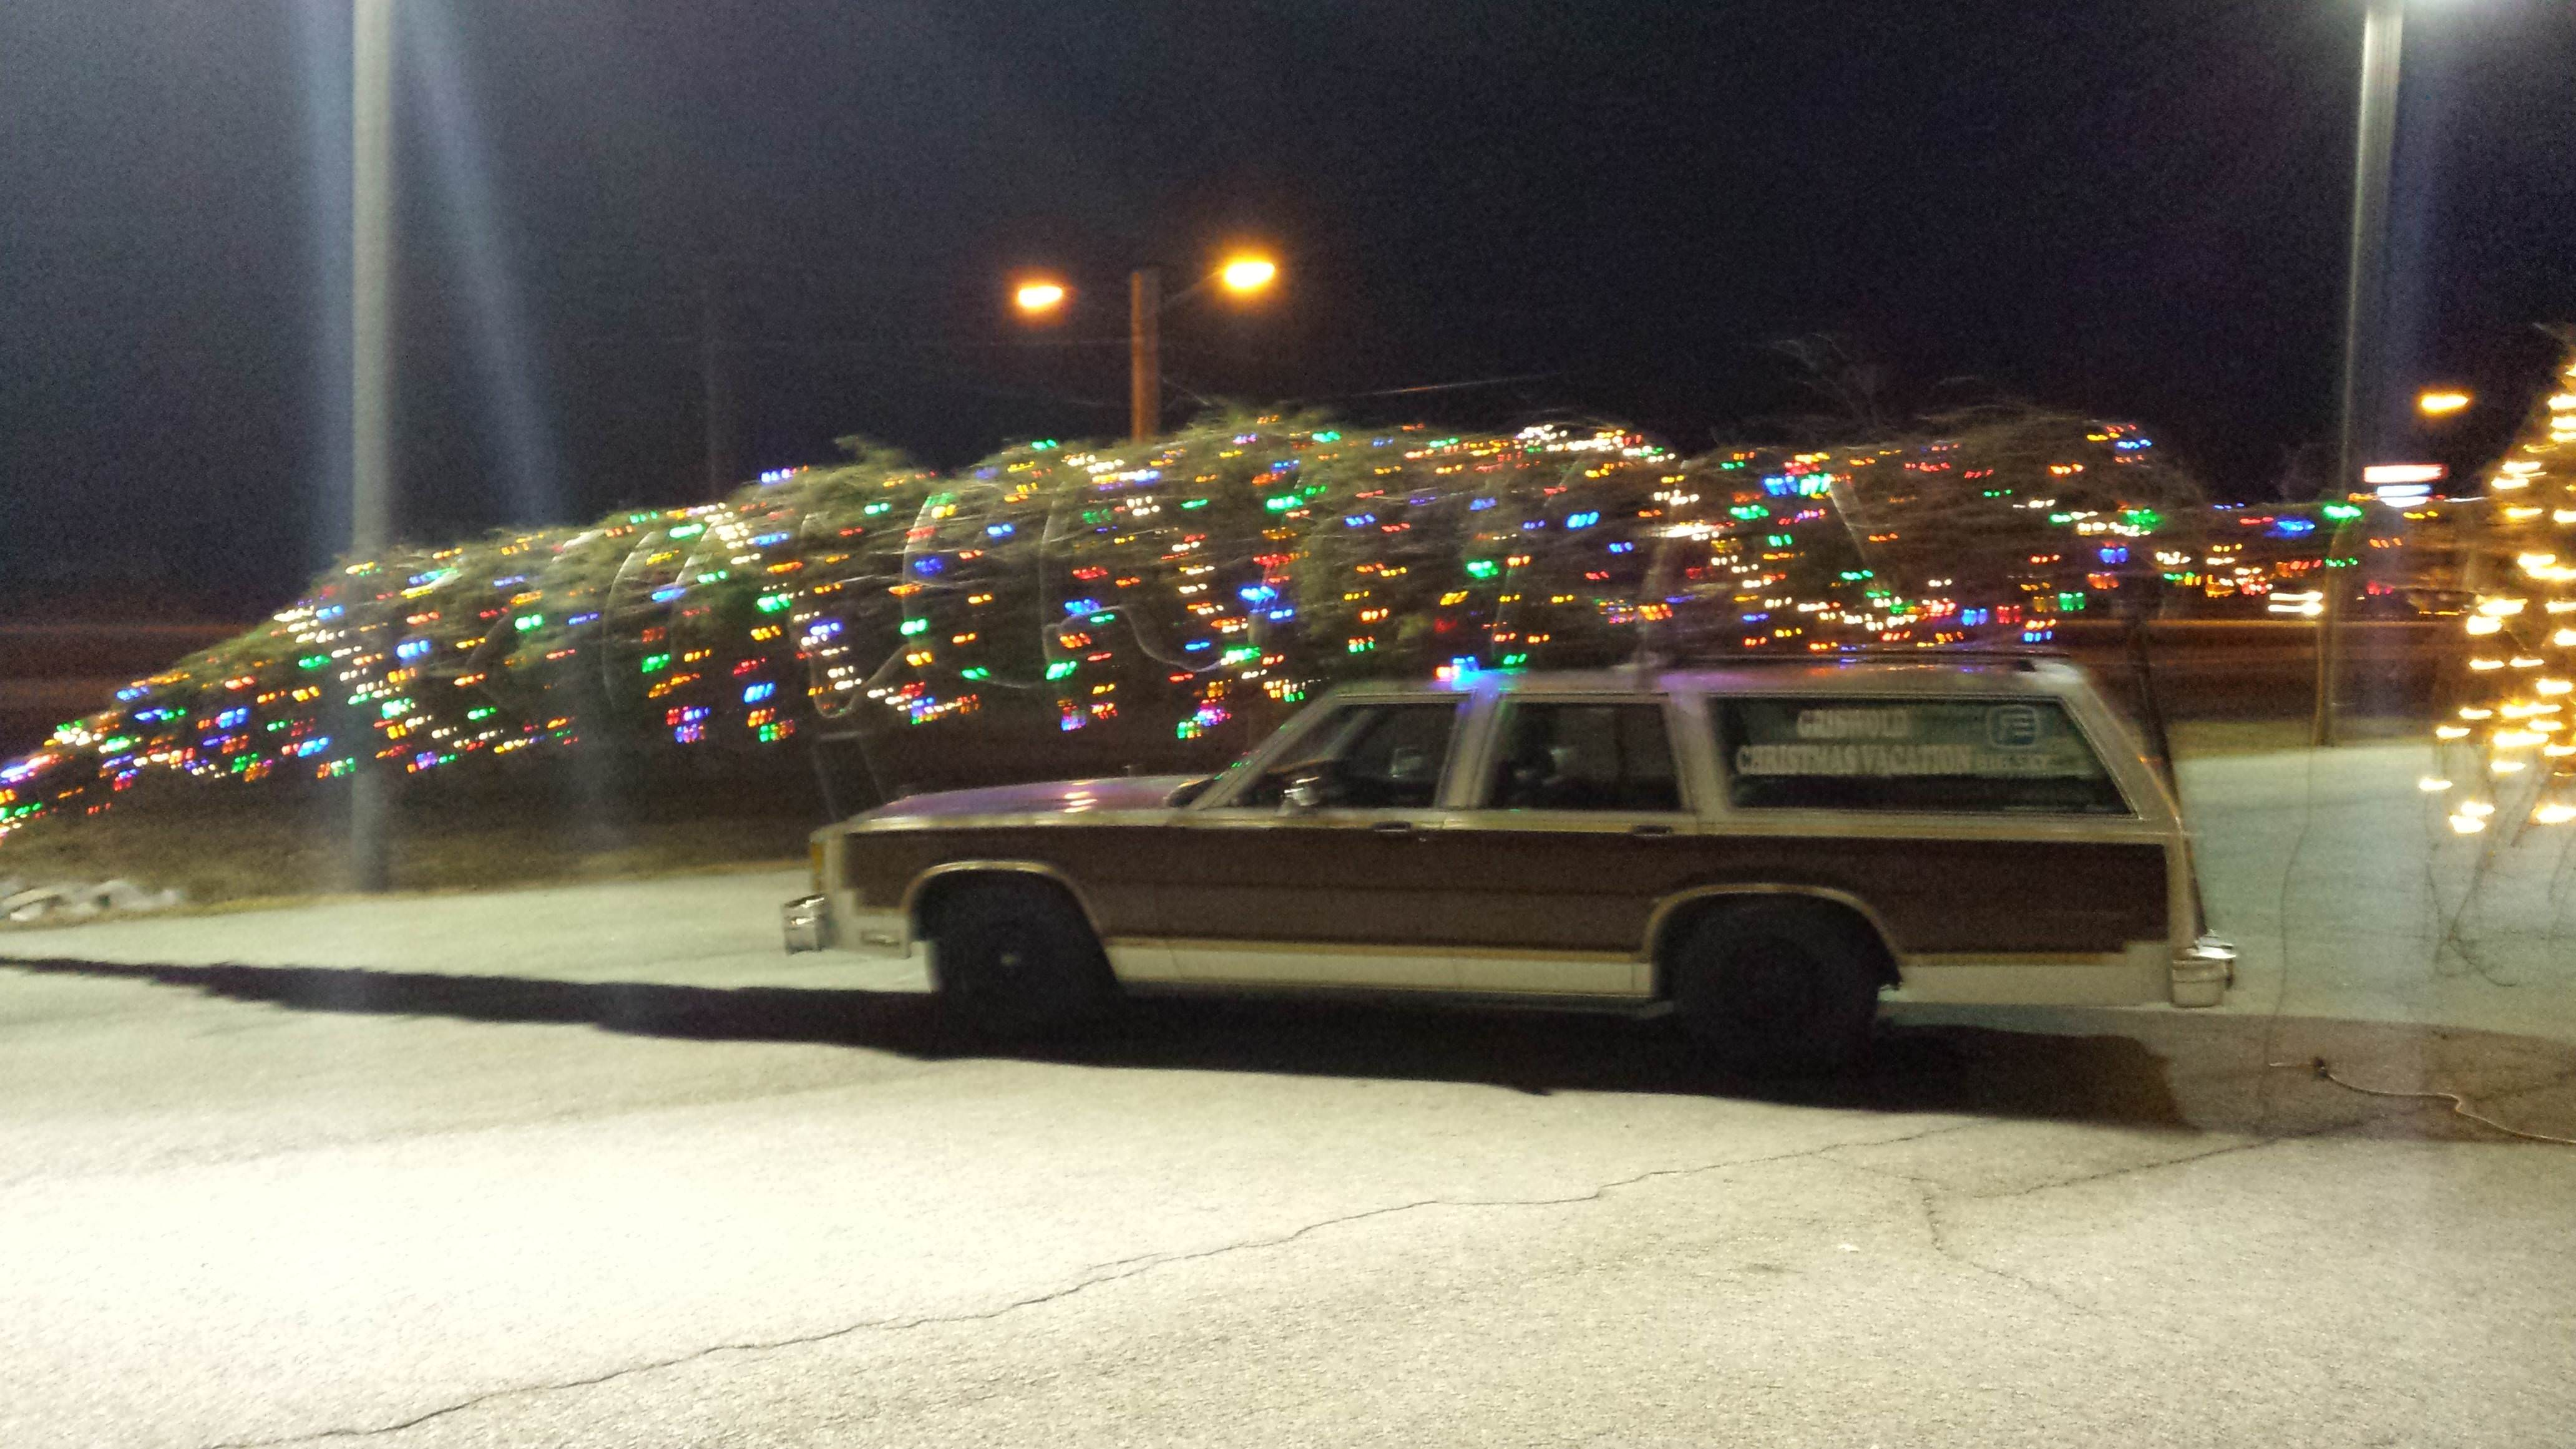 christmas tree for a car